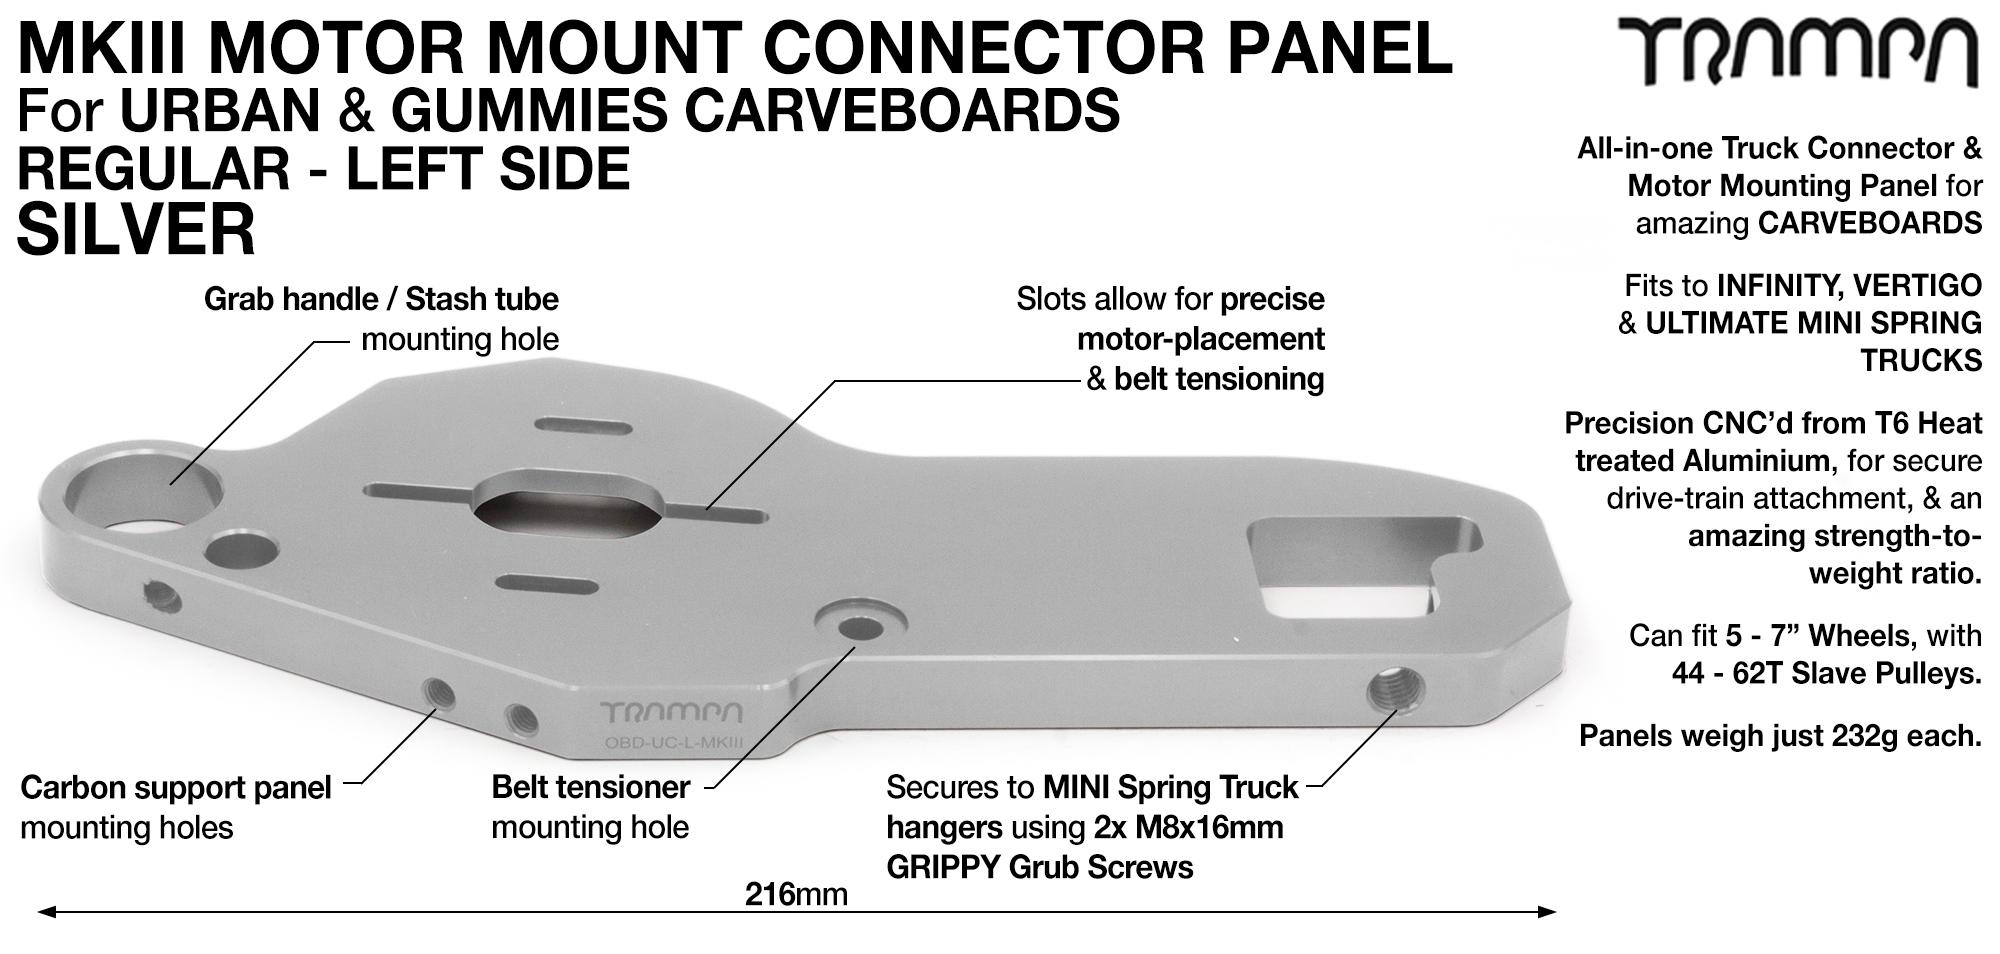 MkIII CARVE Truck Motor Mount T6 Aluminium Anodised - REGULAR SILVER